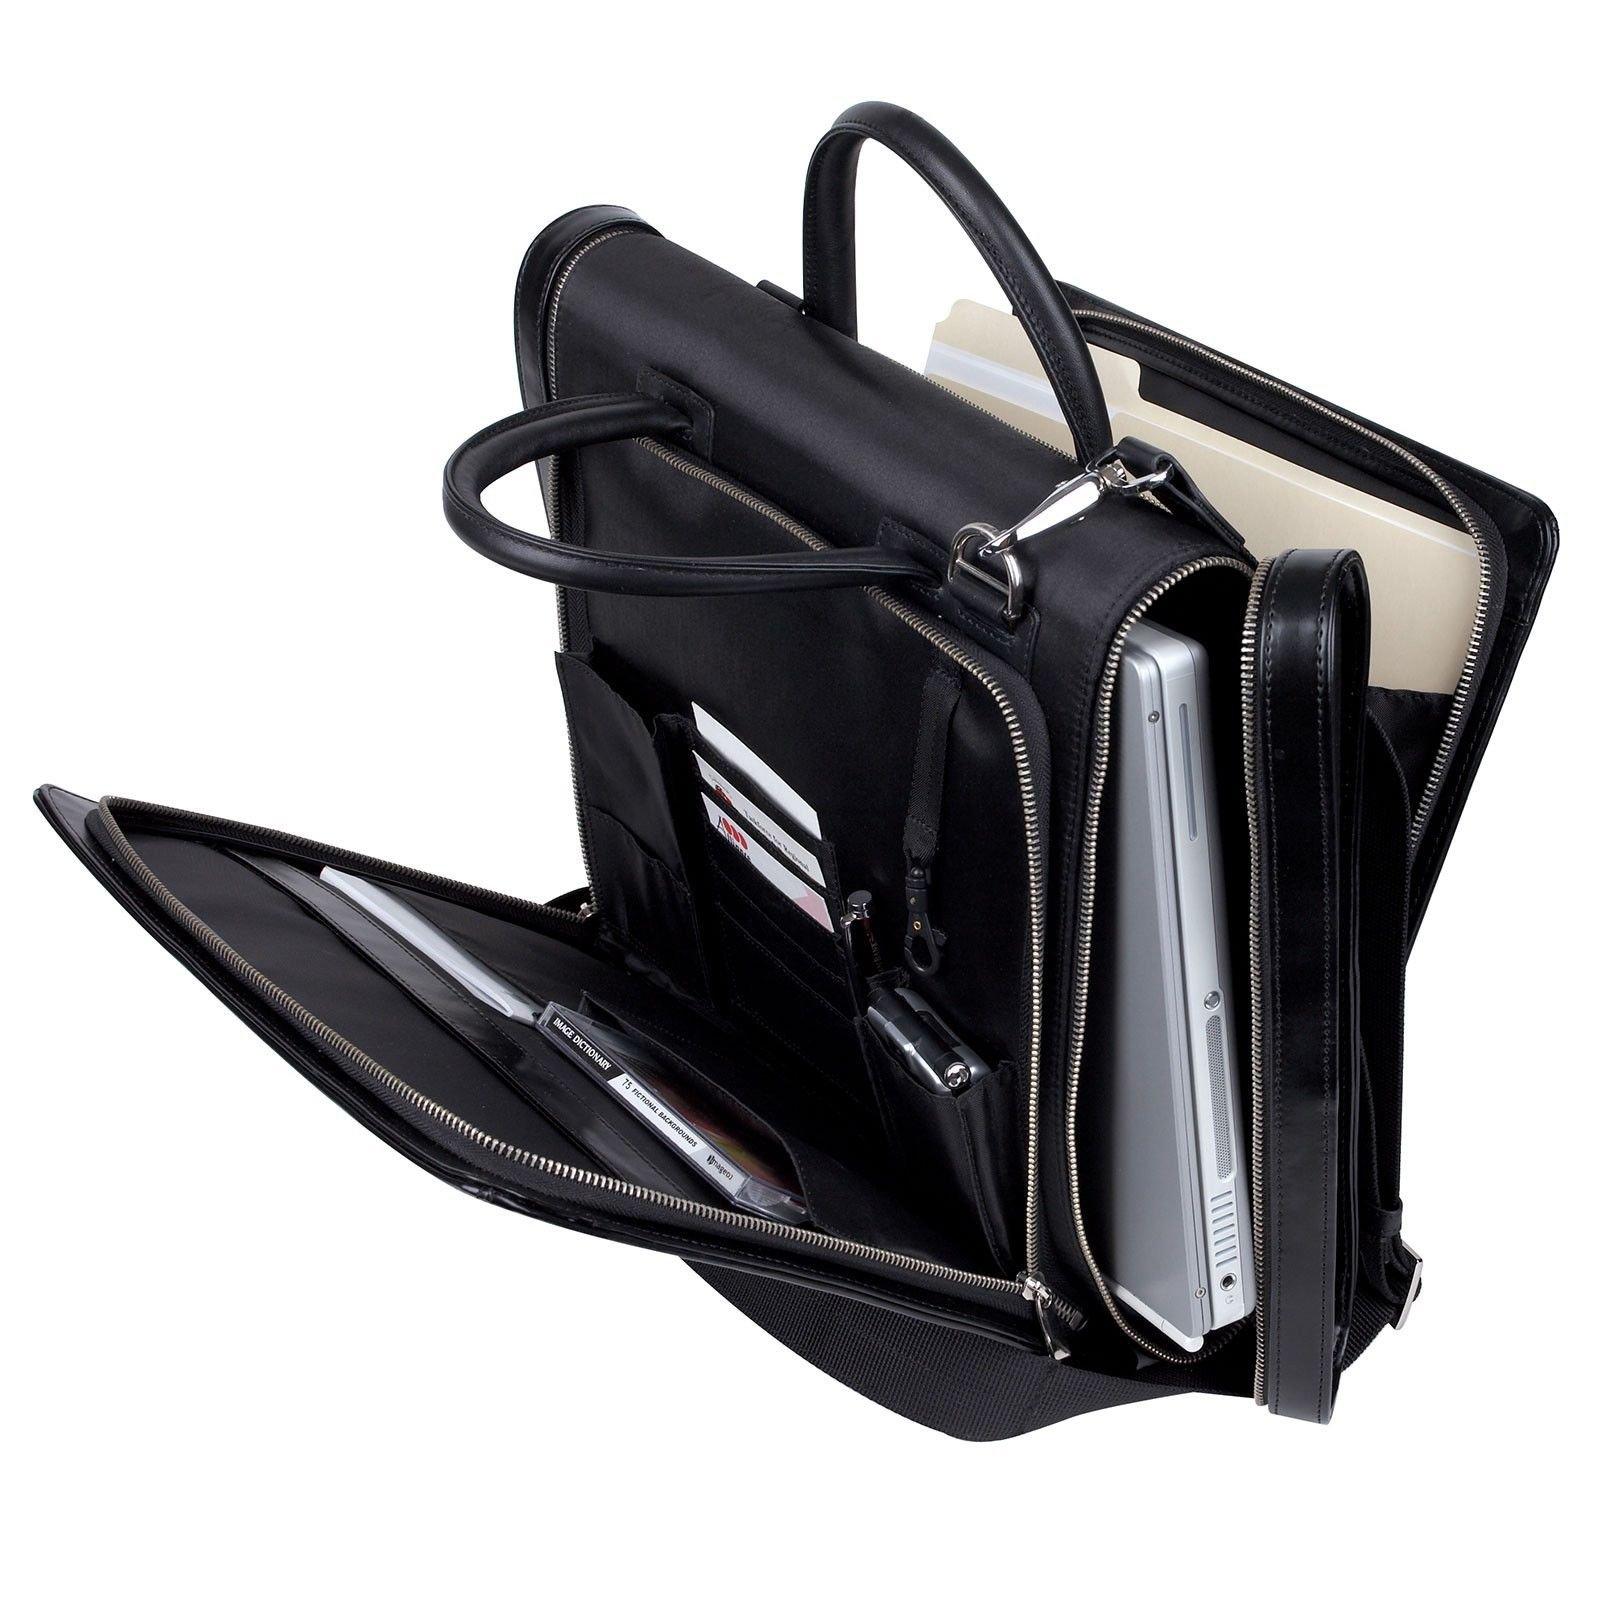 IMPECGEAR Manthattan Leather Trims Messenger Bag and handle Computer Shoulder Bag 15.4 Laptop by ImpecGear (Image #2)